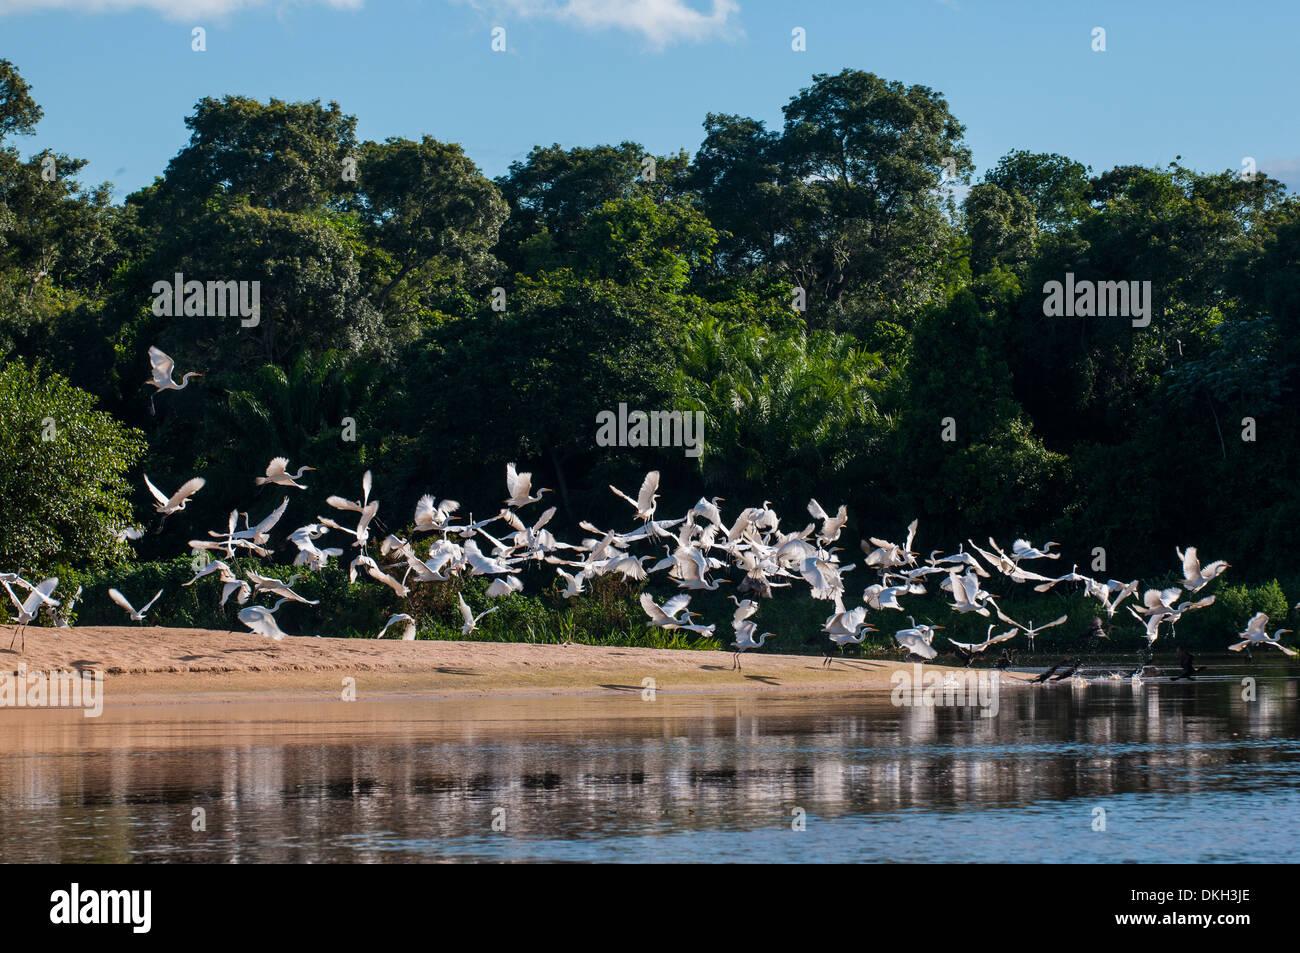 Flocks of Graza Mora, Pantanal Conservation Area, UNESCO World Heritage Site, Brazil, South America - Stock Image